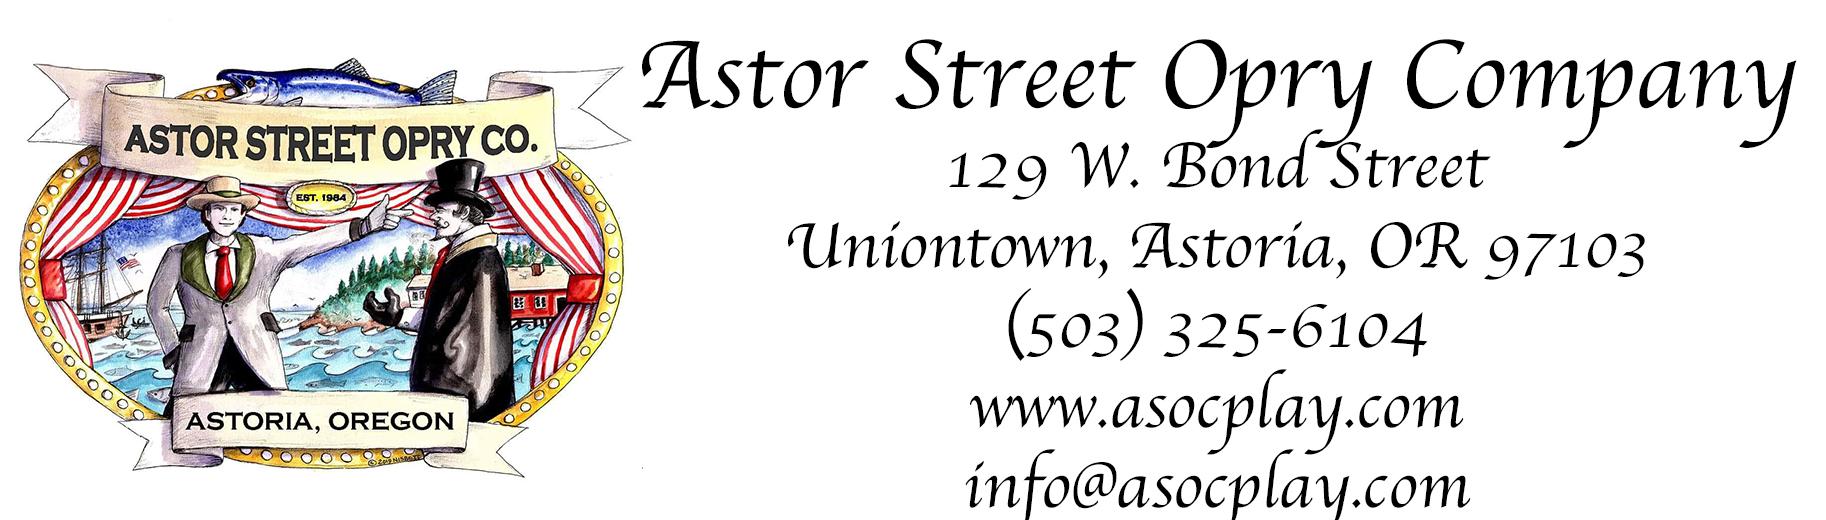 Astor Street Opry Company Logo